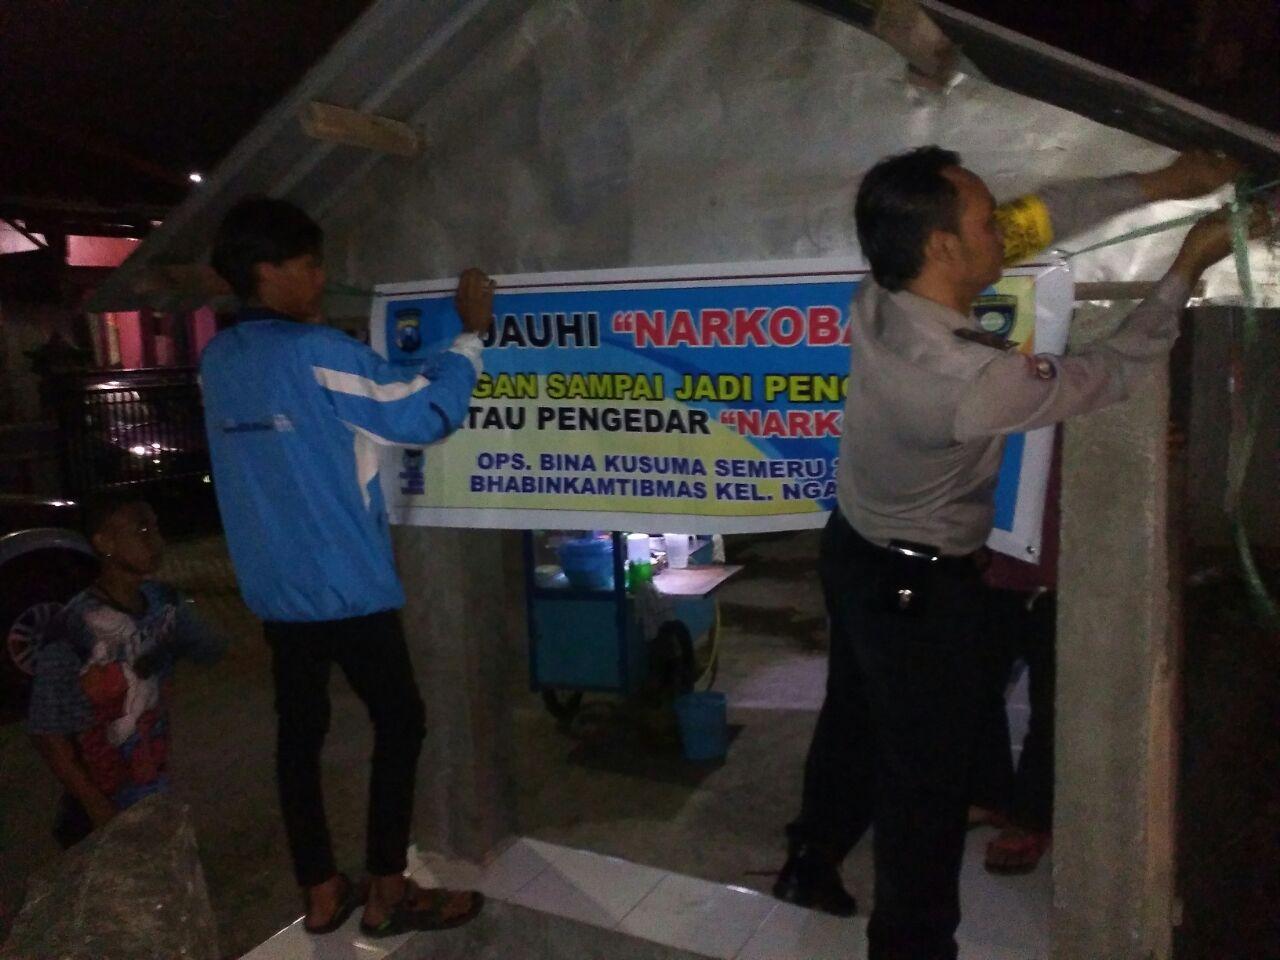 Operasi Bina Kusuma Semeru 2017 Bhabin Kel. Ngaglik Polsek Batu Kota Polres Batu Pasang Banner Himbauan Perangi Narkoba